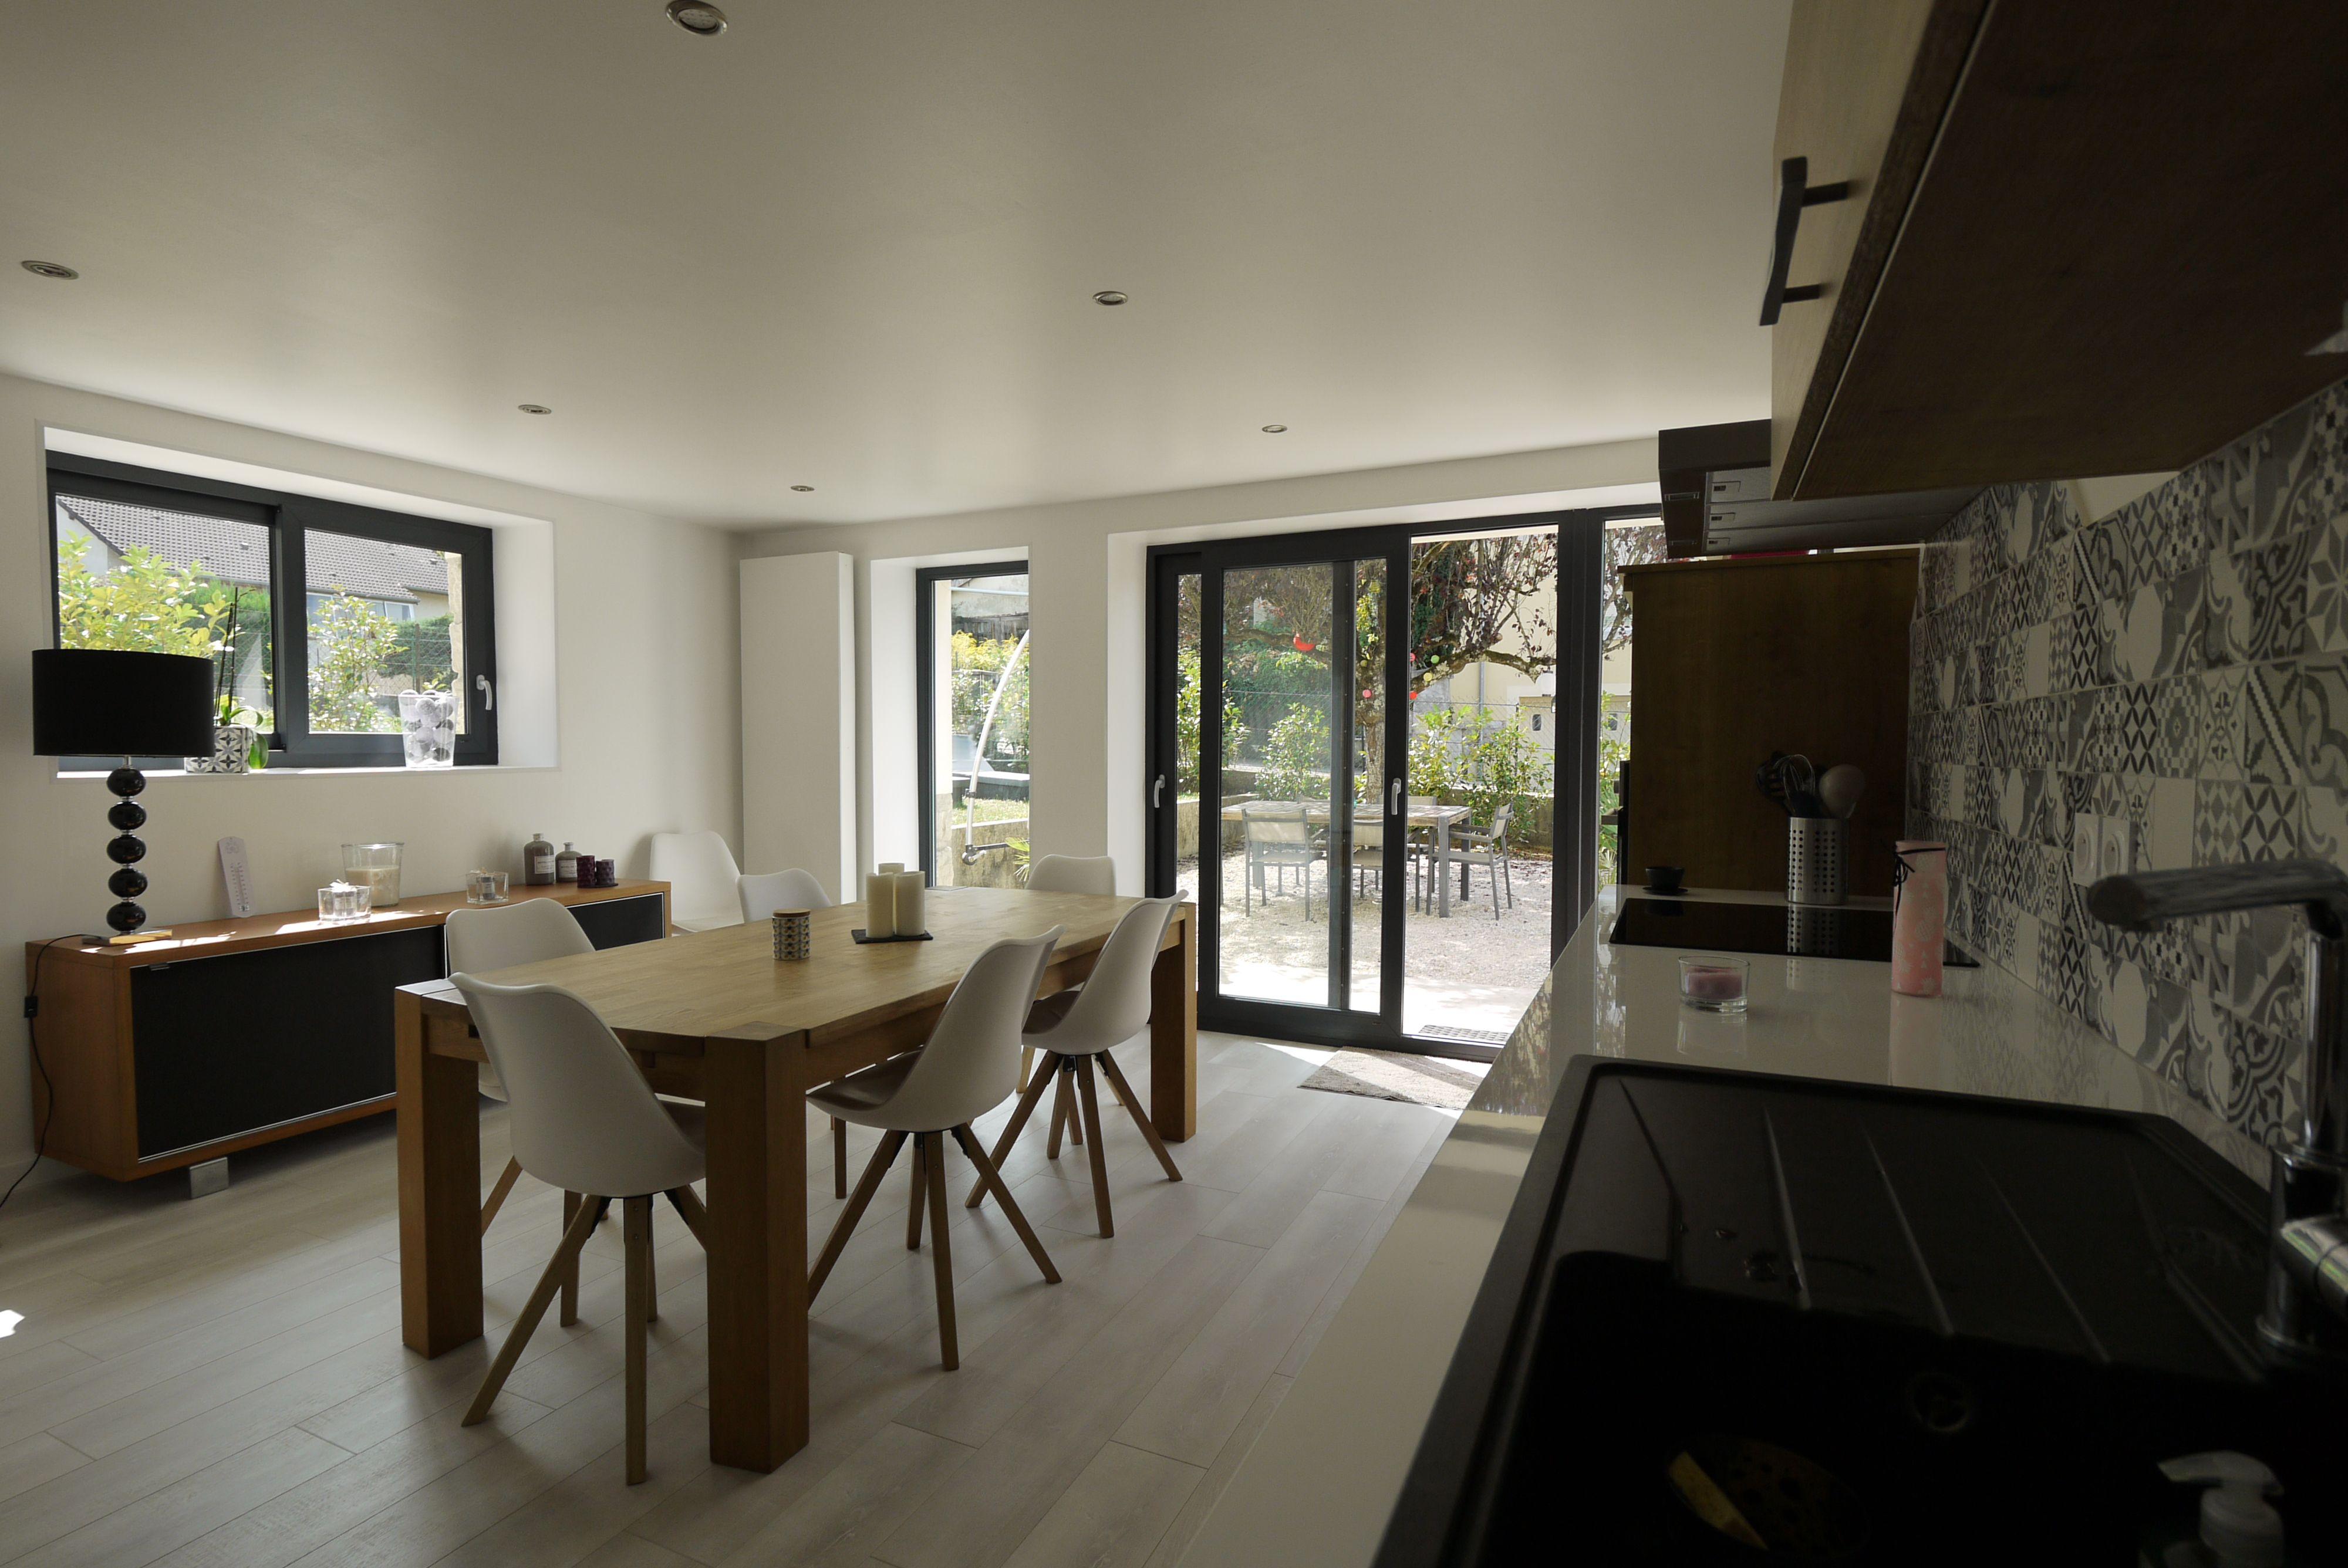 exclusivit lons le saunier intra muros maison individuelle entirement rnove 5 chambres - Classement Energetique Maison Individuelle